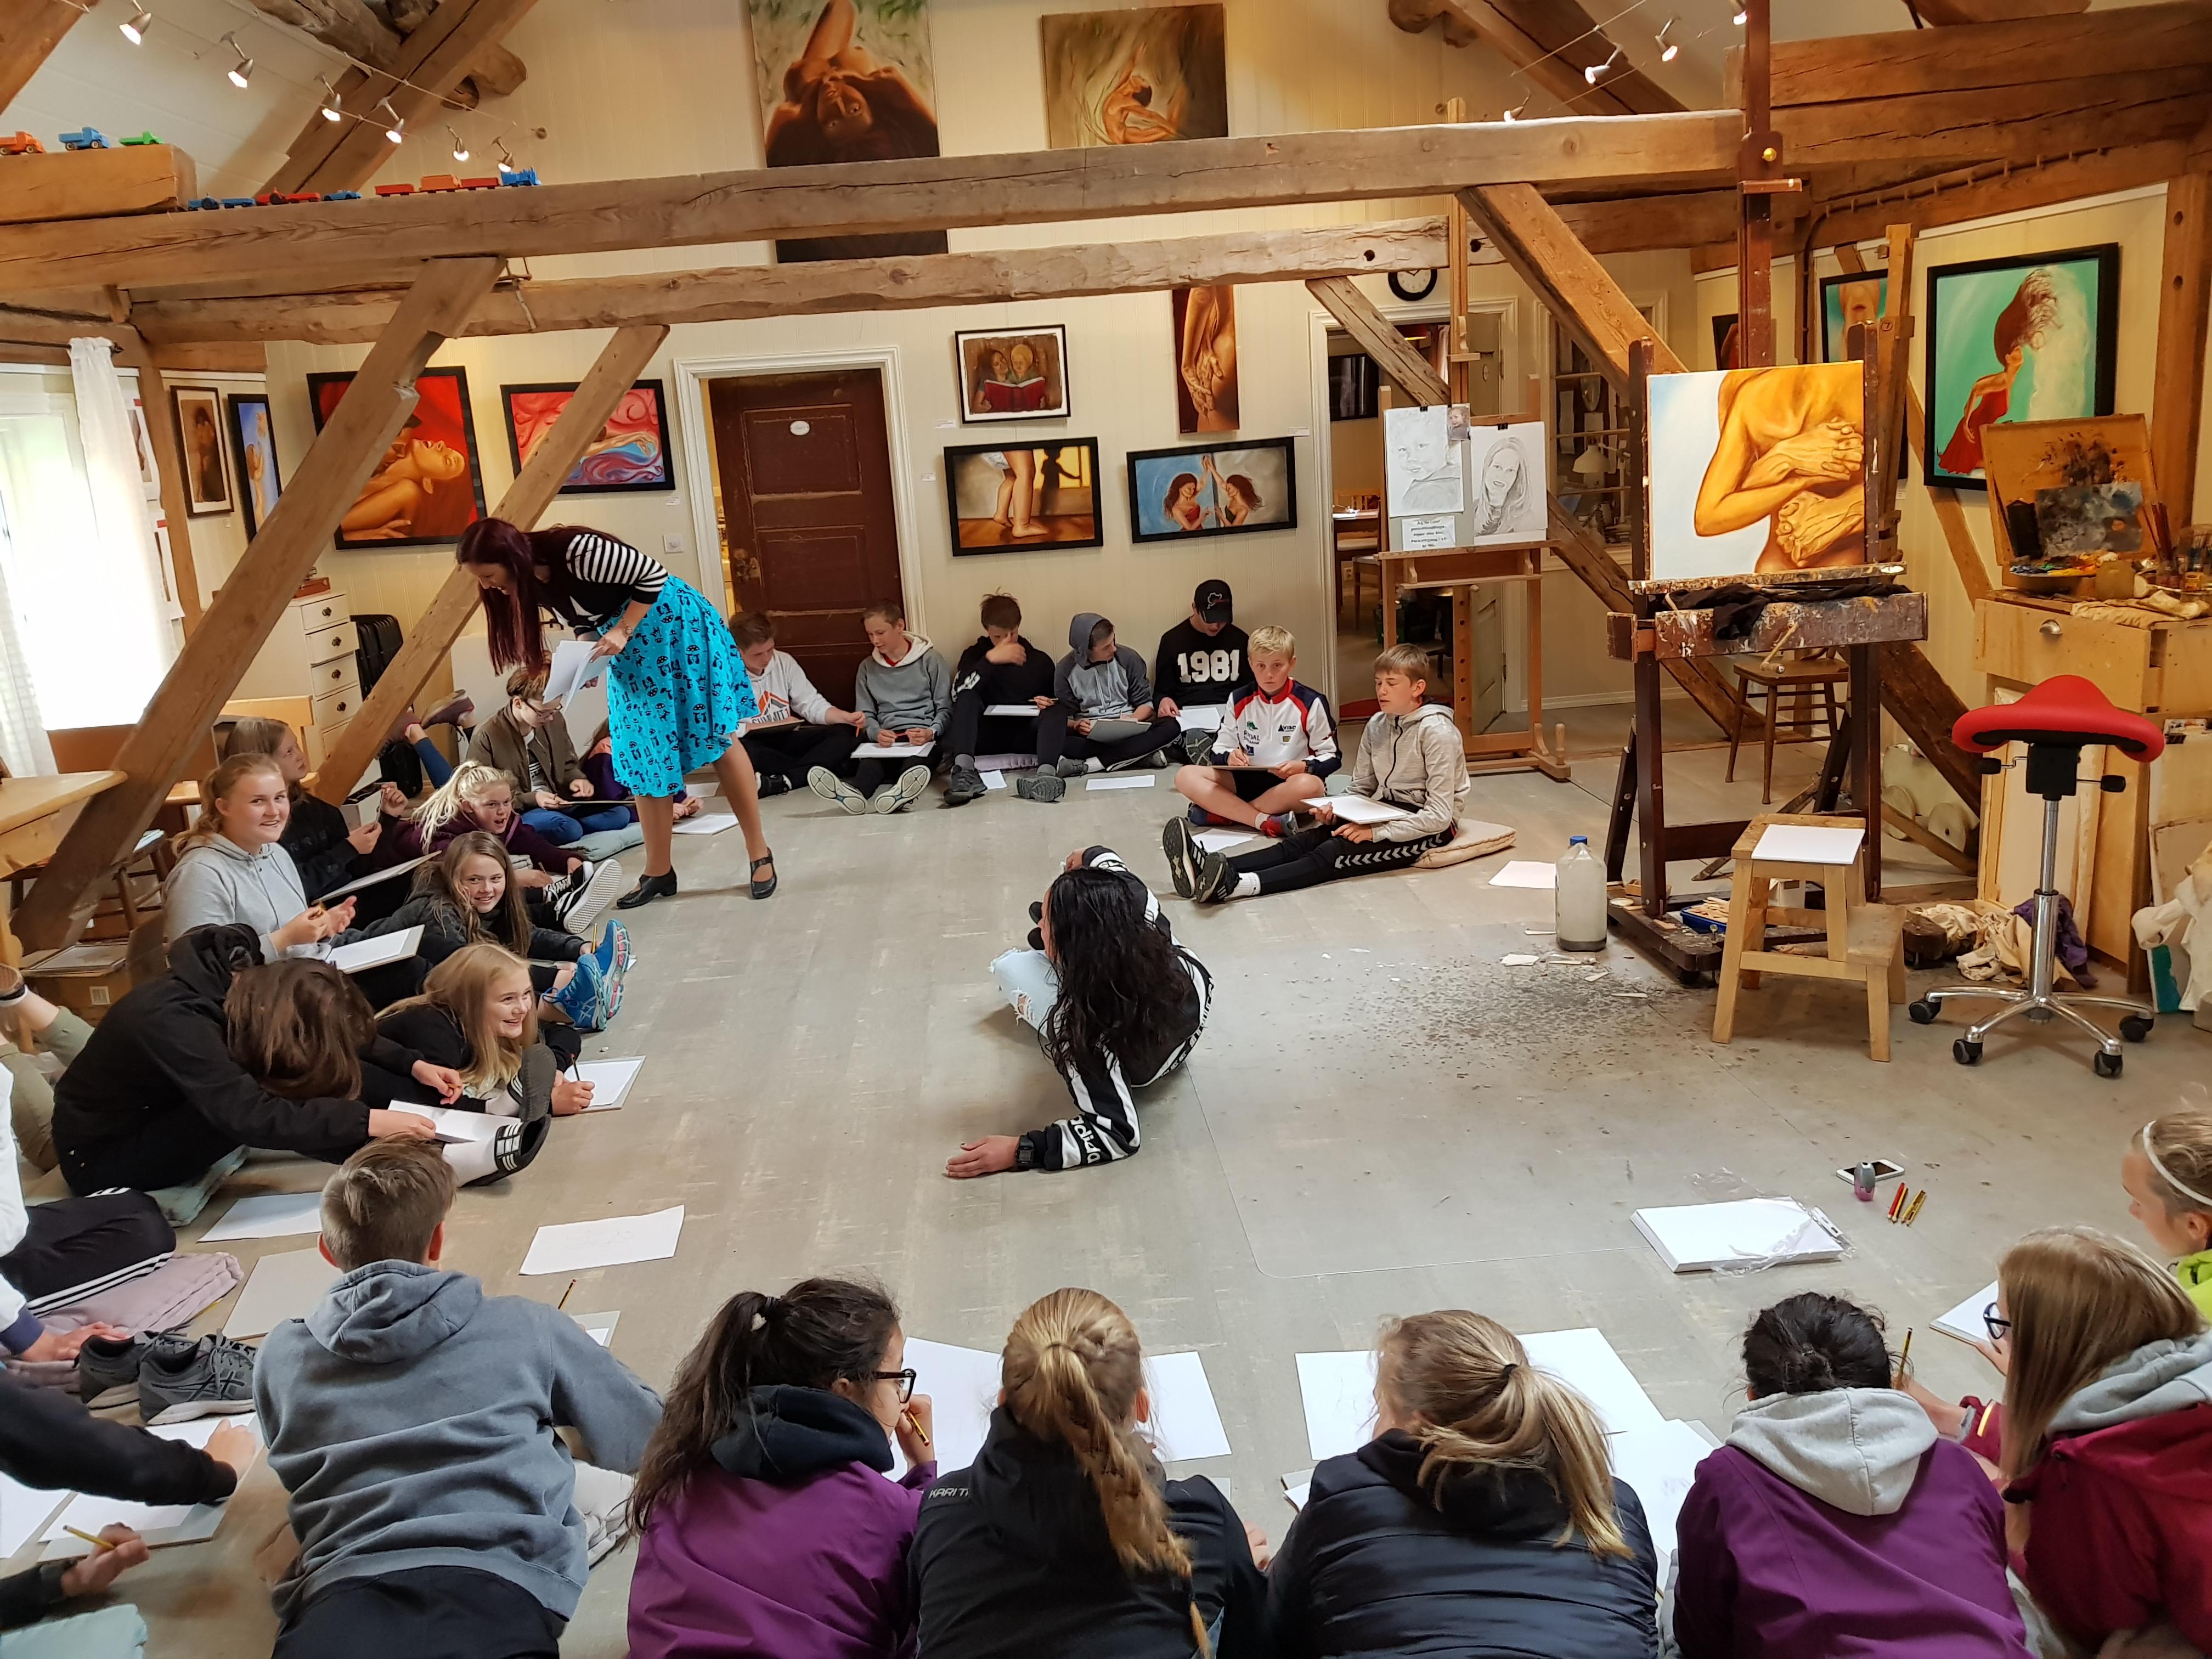 Life drawing classes at Rørosmartnan - Inga Dalsegg